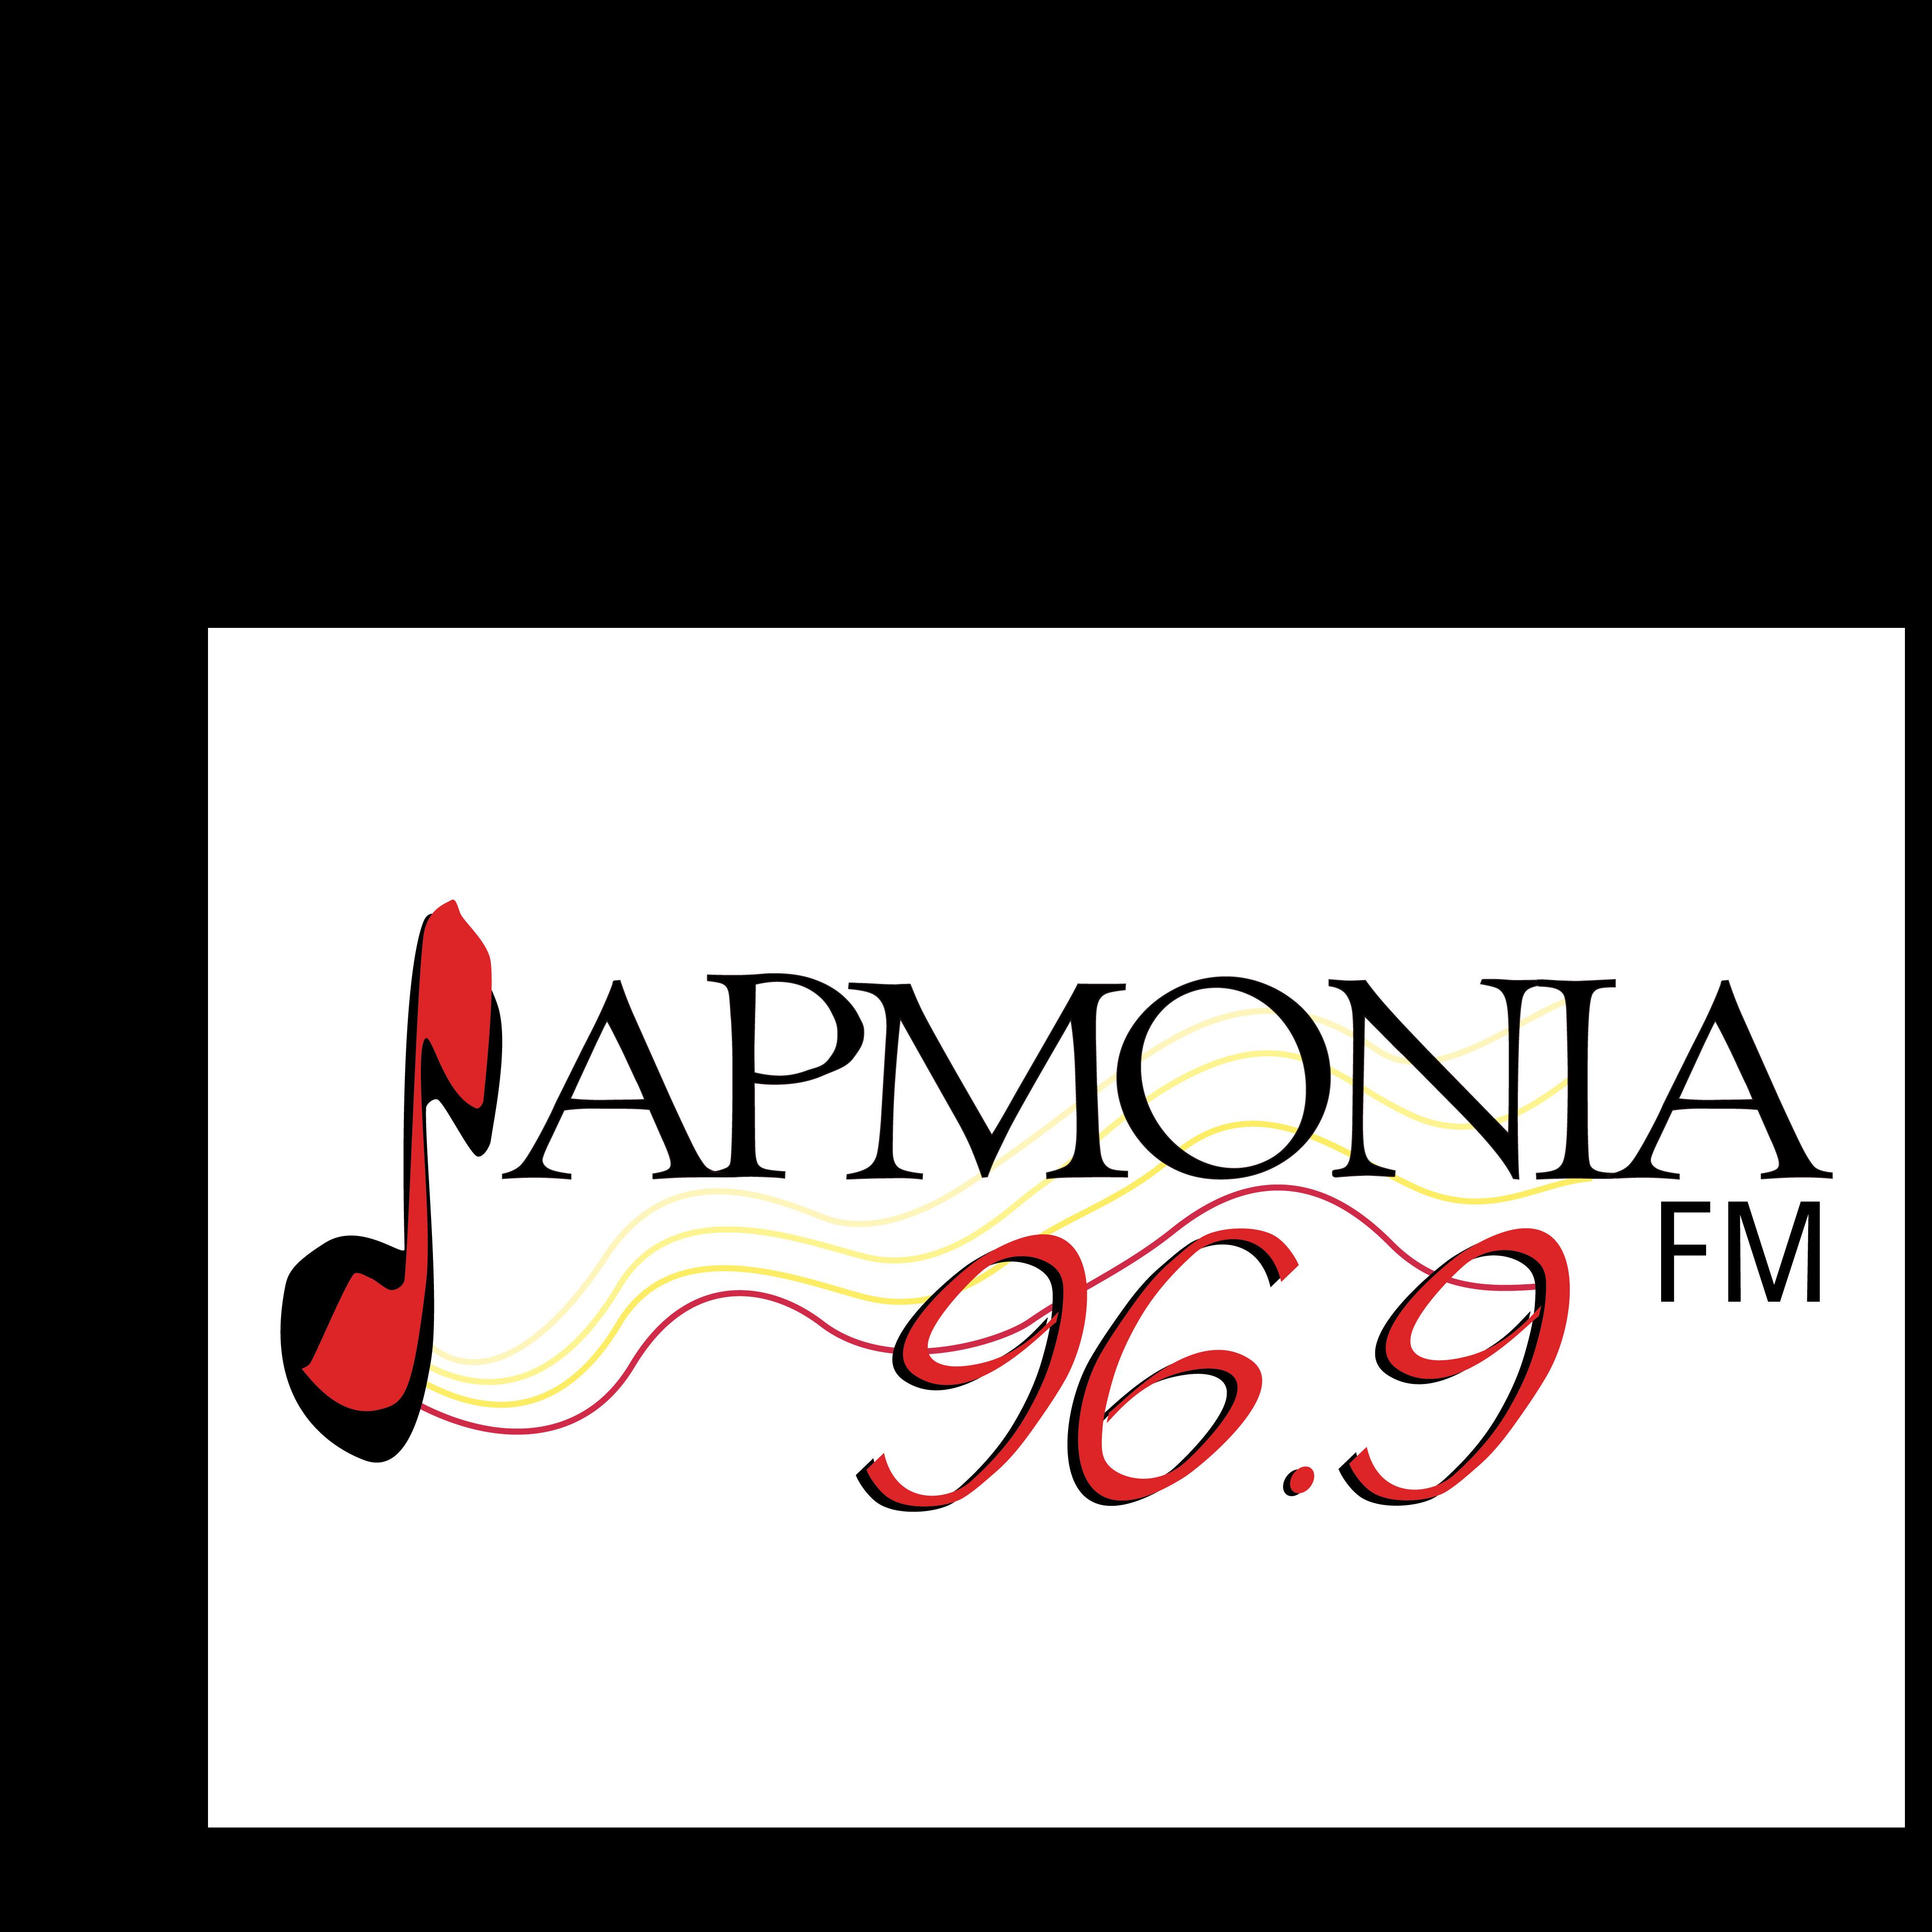 ??????? FM 969